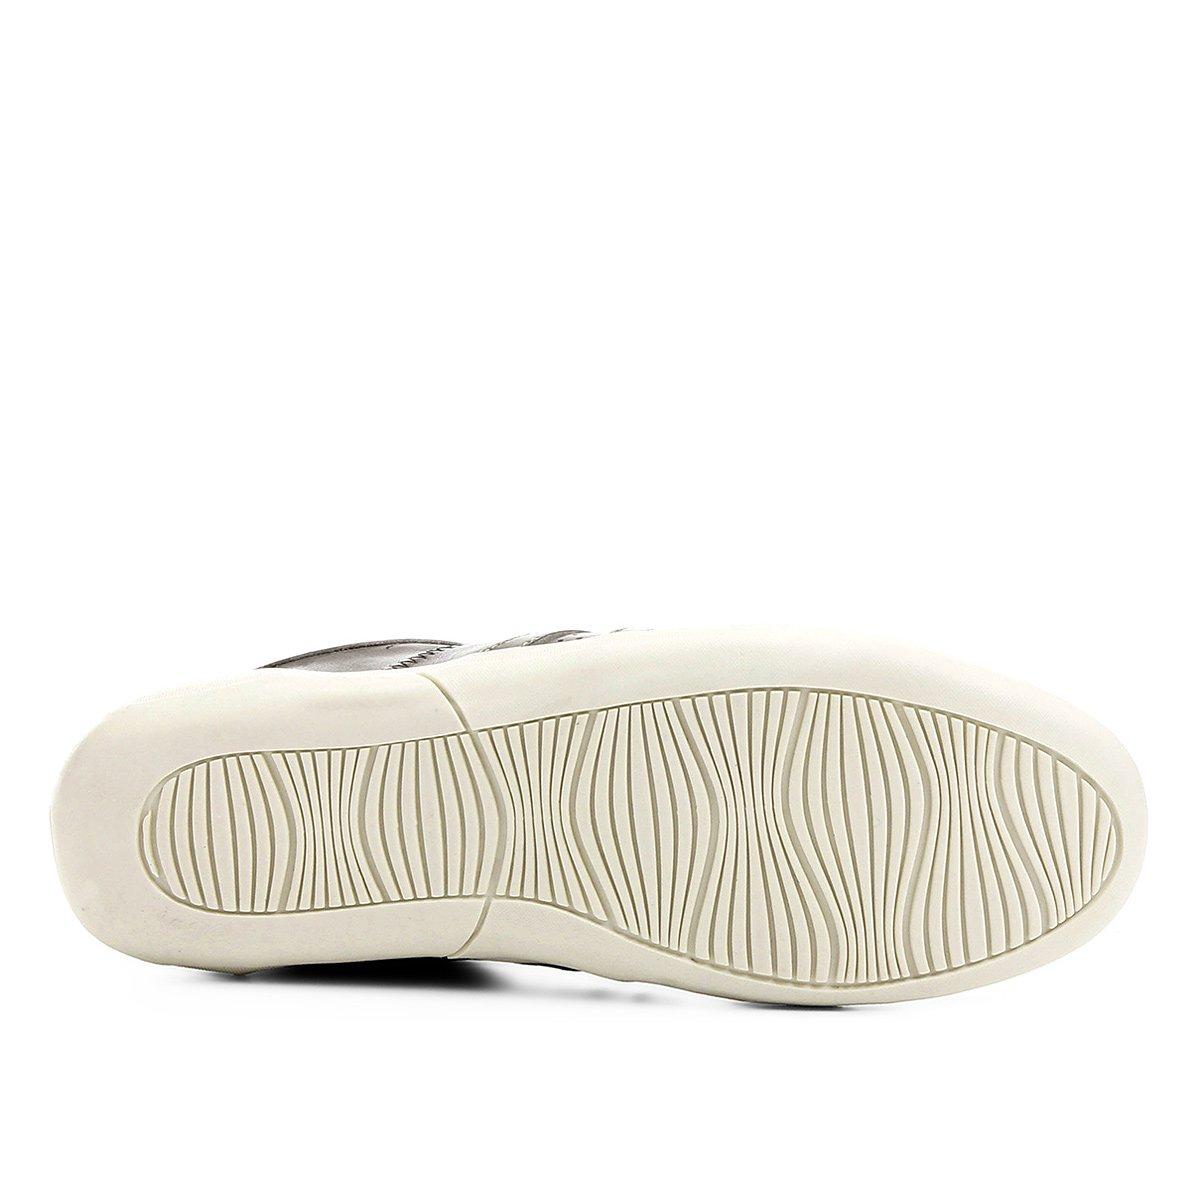 Ilhós Sapatênis Shoestock Shoestock Sapatênis Ilhós Shoestock Cinza Couro Couro Ilhós Cinza Cinza Couro Sapatênis 1qx7A6Cr1w